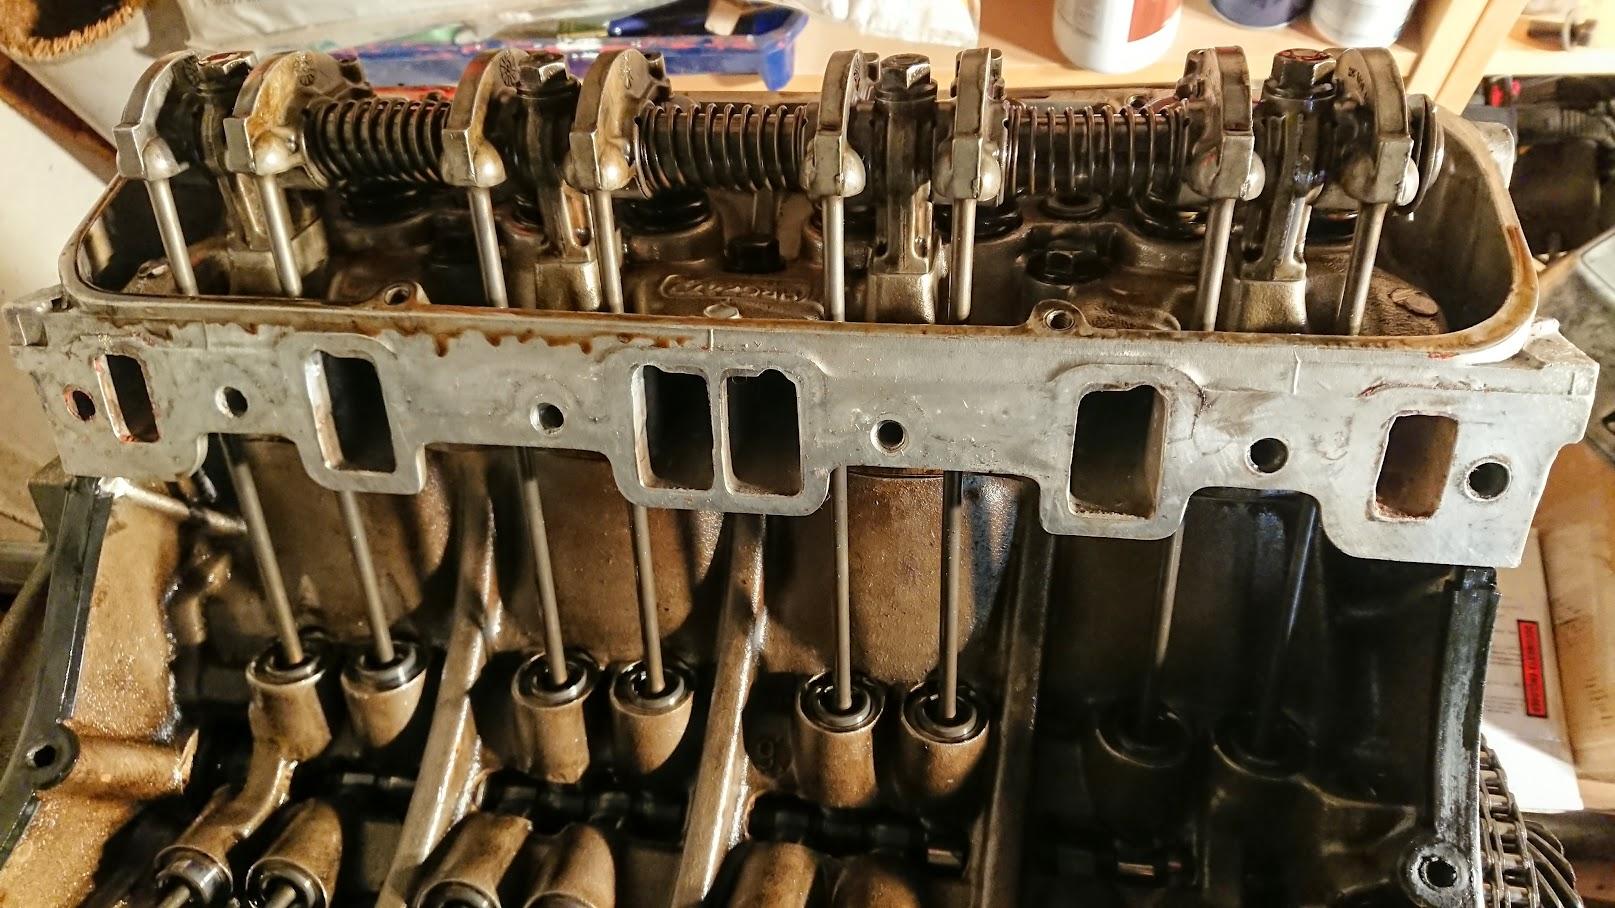 Engine stripdown and crankshaft modification